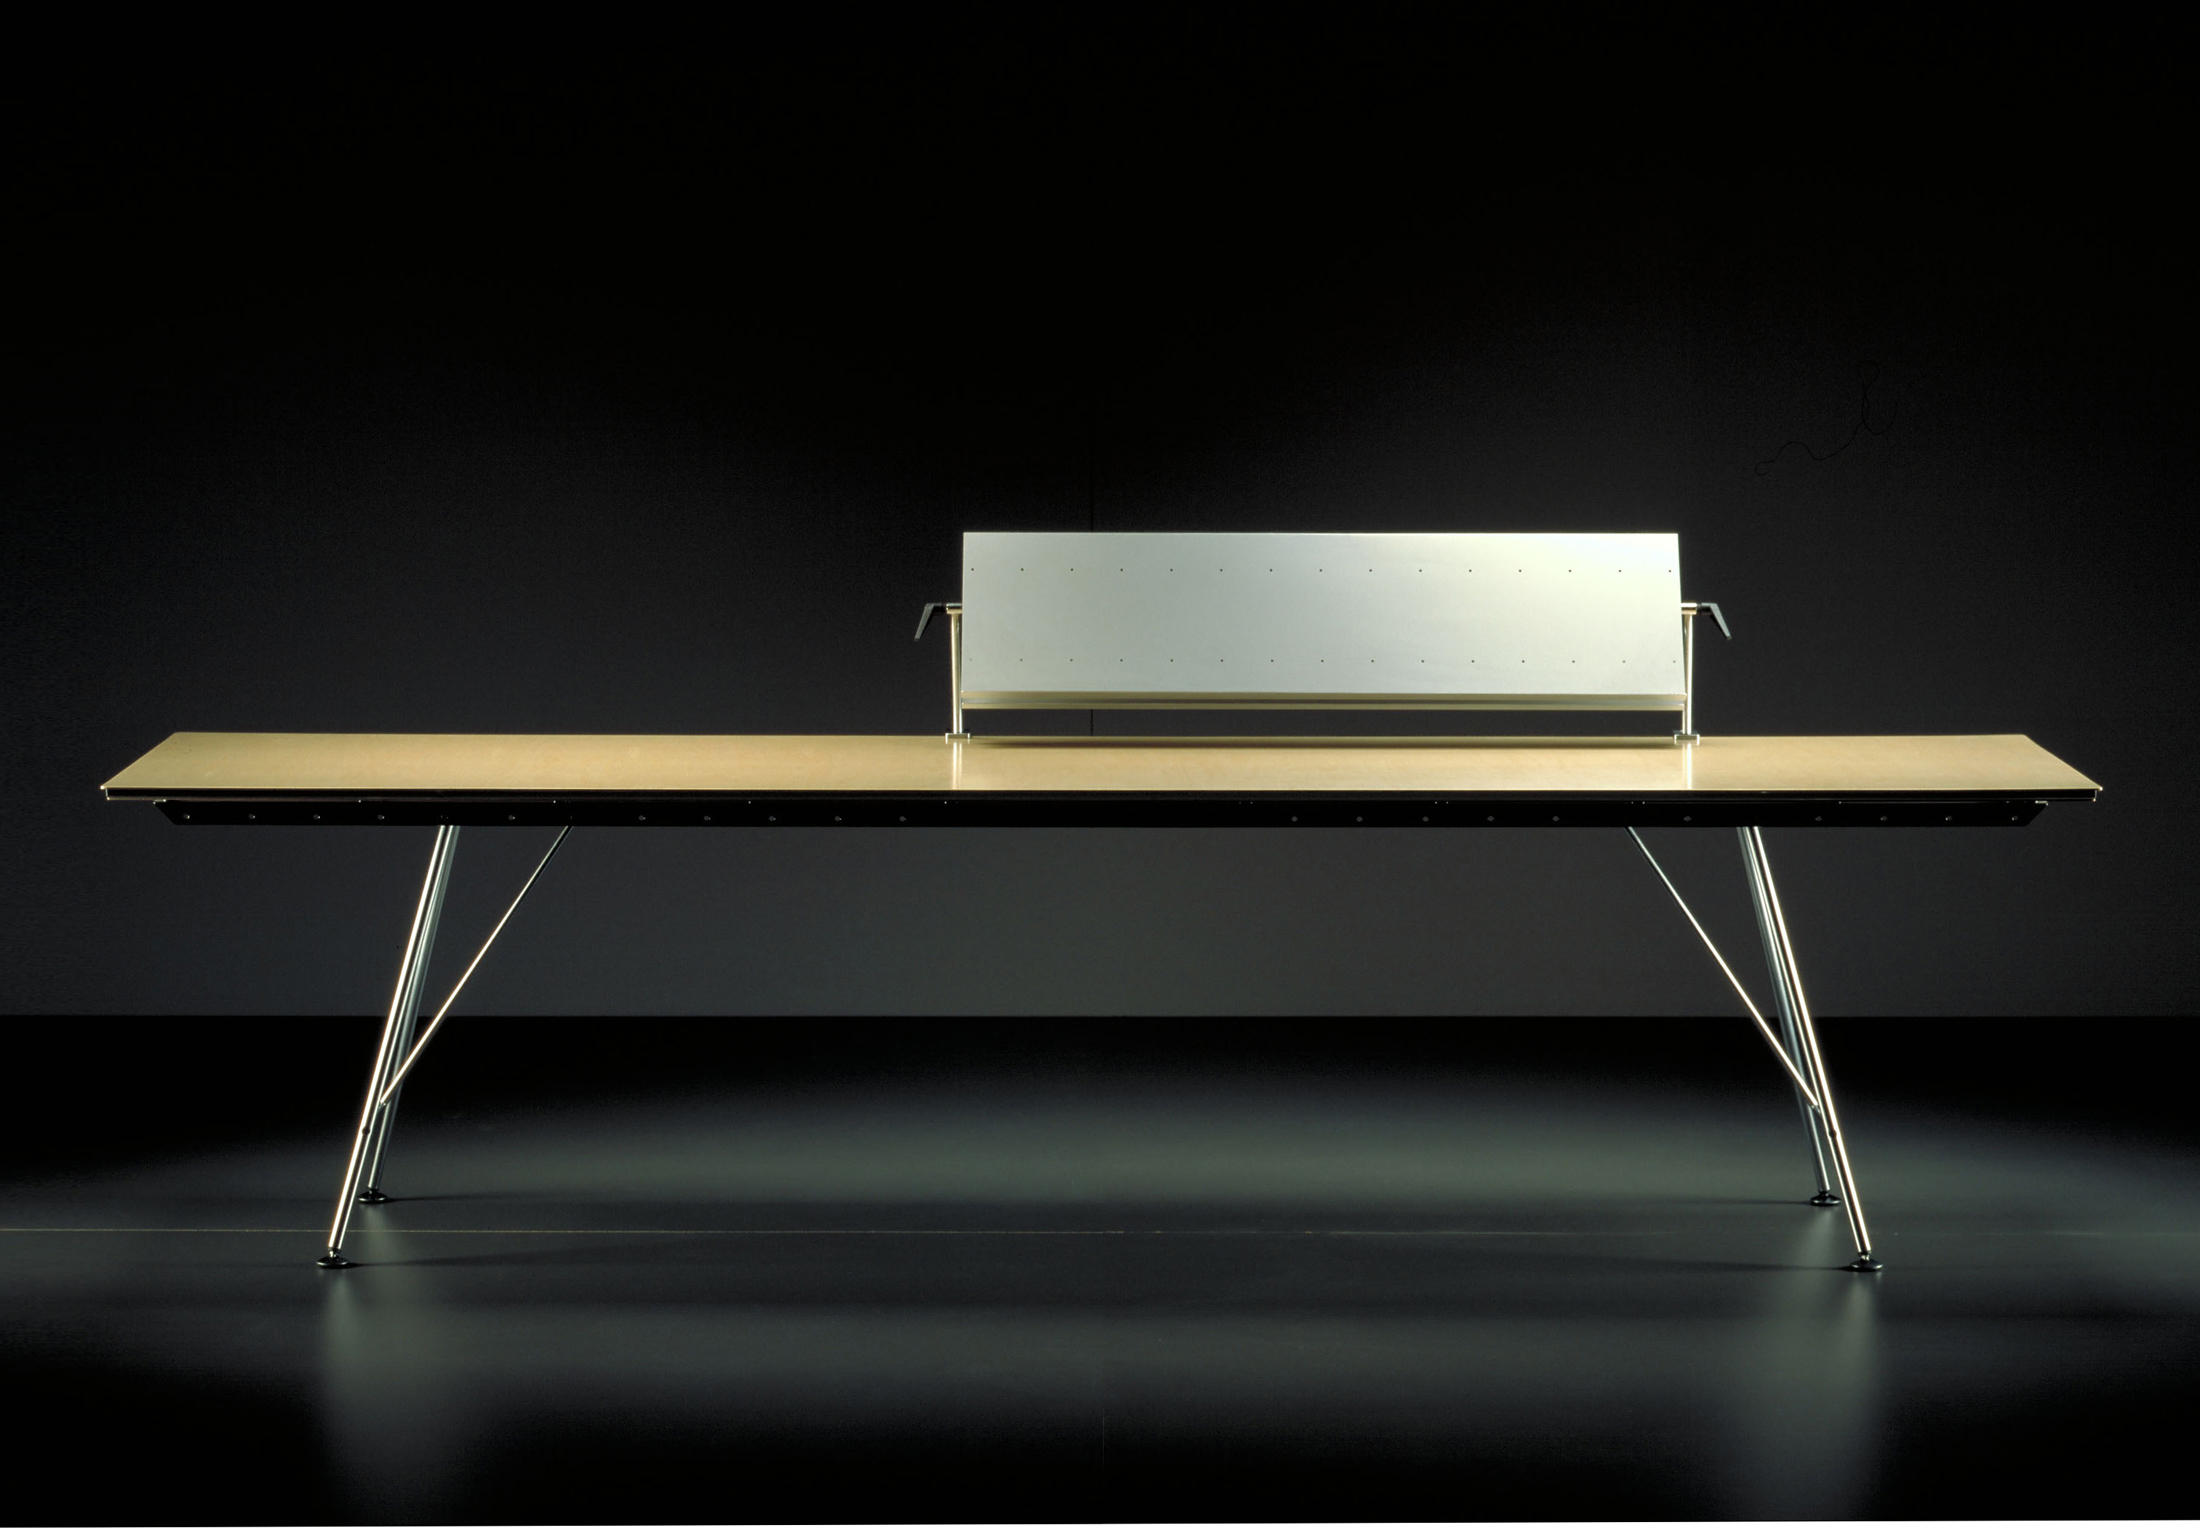 unistandardtisch individual desks from atelier alinea. Black Bedroom Furniture Sets. Home Design Ideas